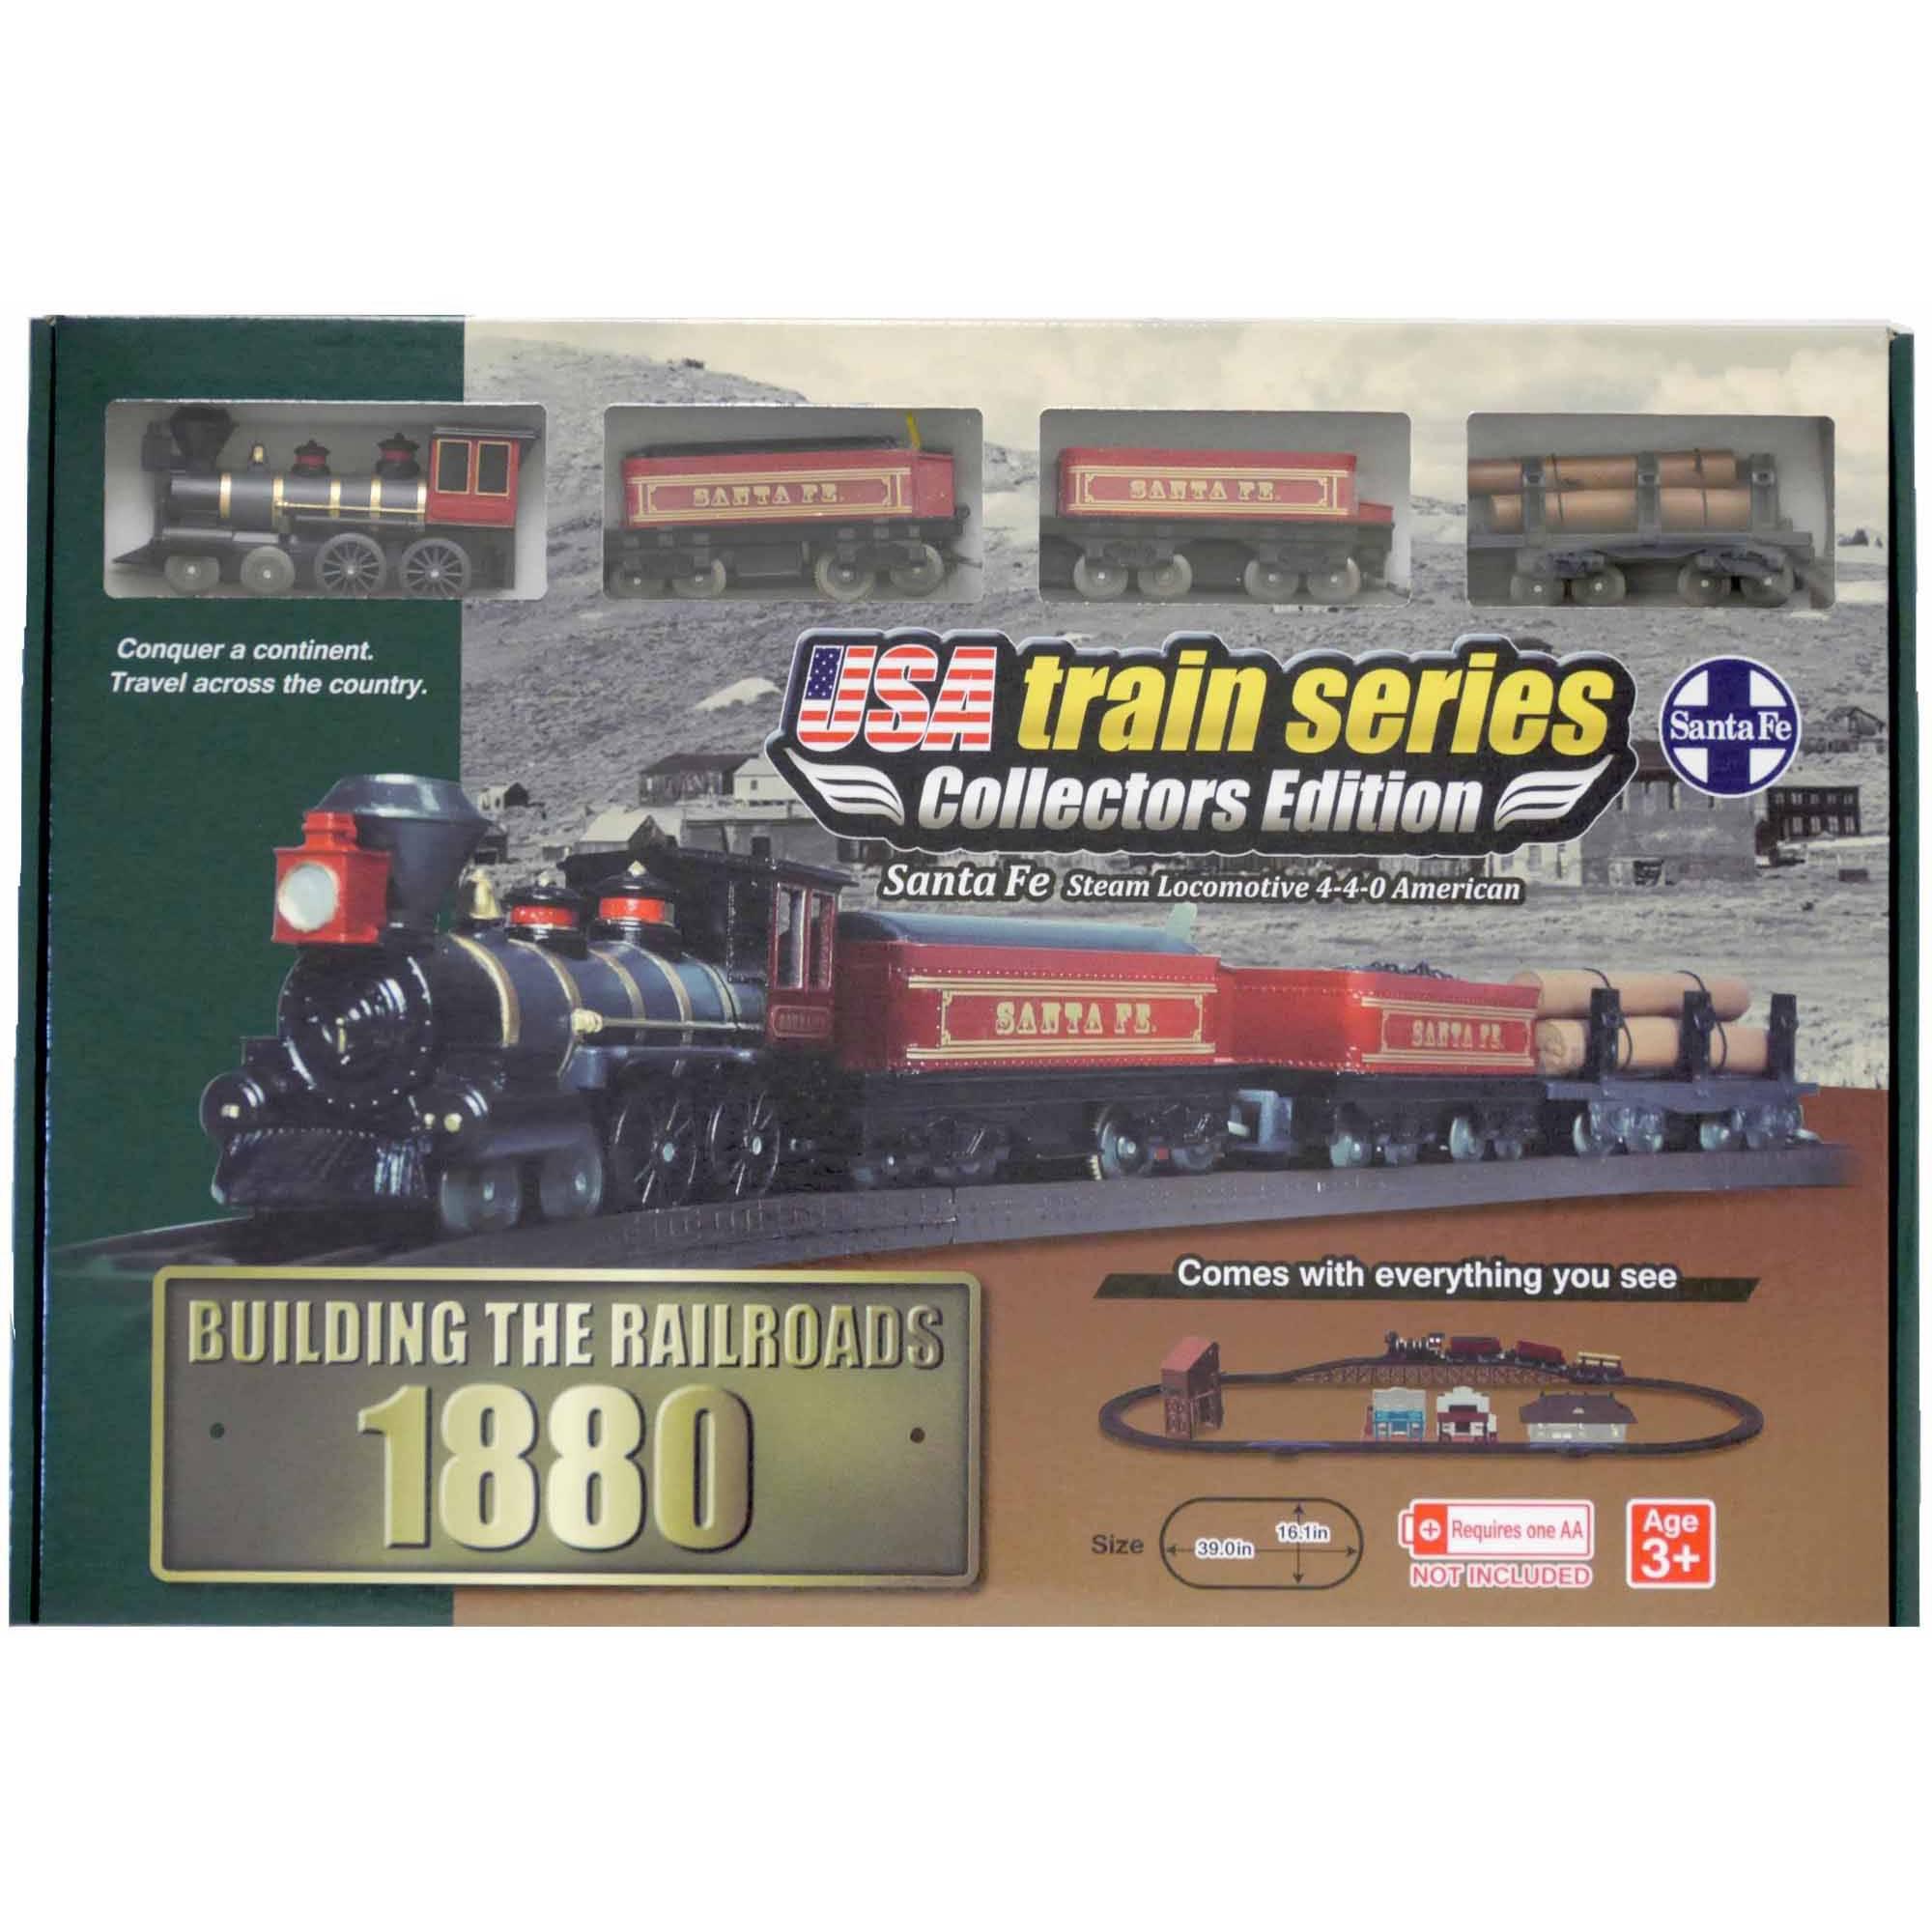 LEC USA 1880 Santa Fe Steam Locomotive 4-4-0 American Battery Operated Train Set